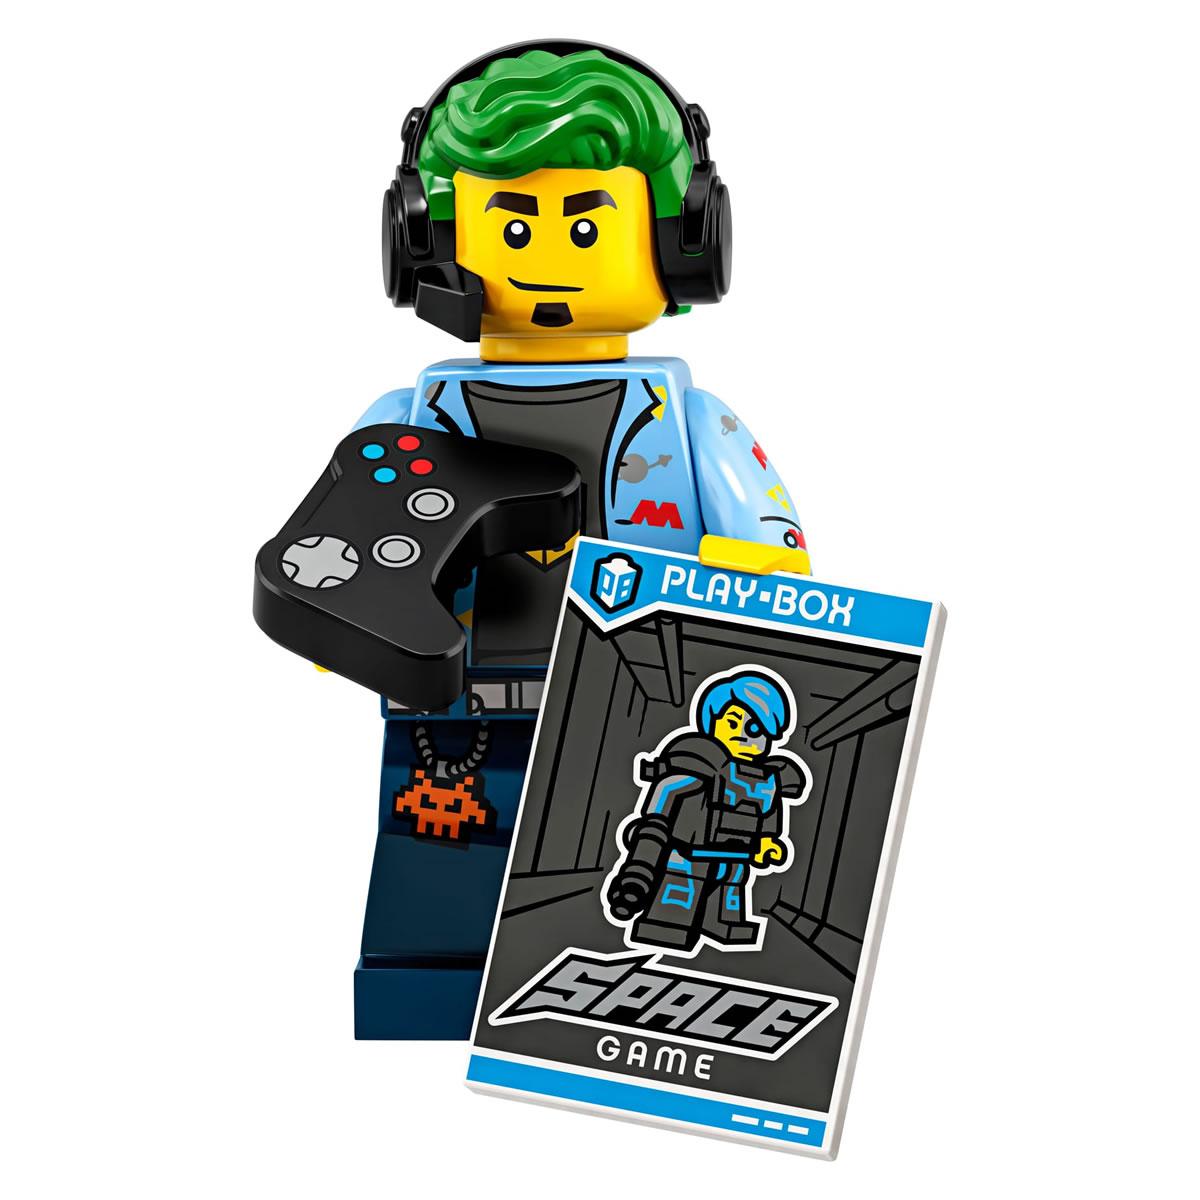 lego-minifiguren-sammelserie-collectible-minifigures-serie-19-71025-2019-3 zusammengebaut.com